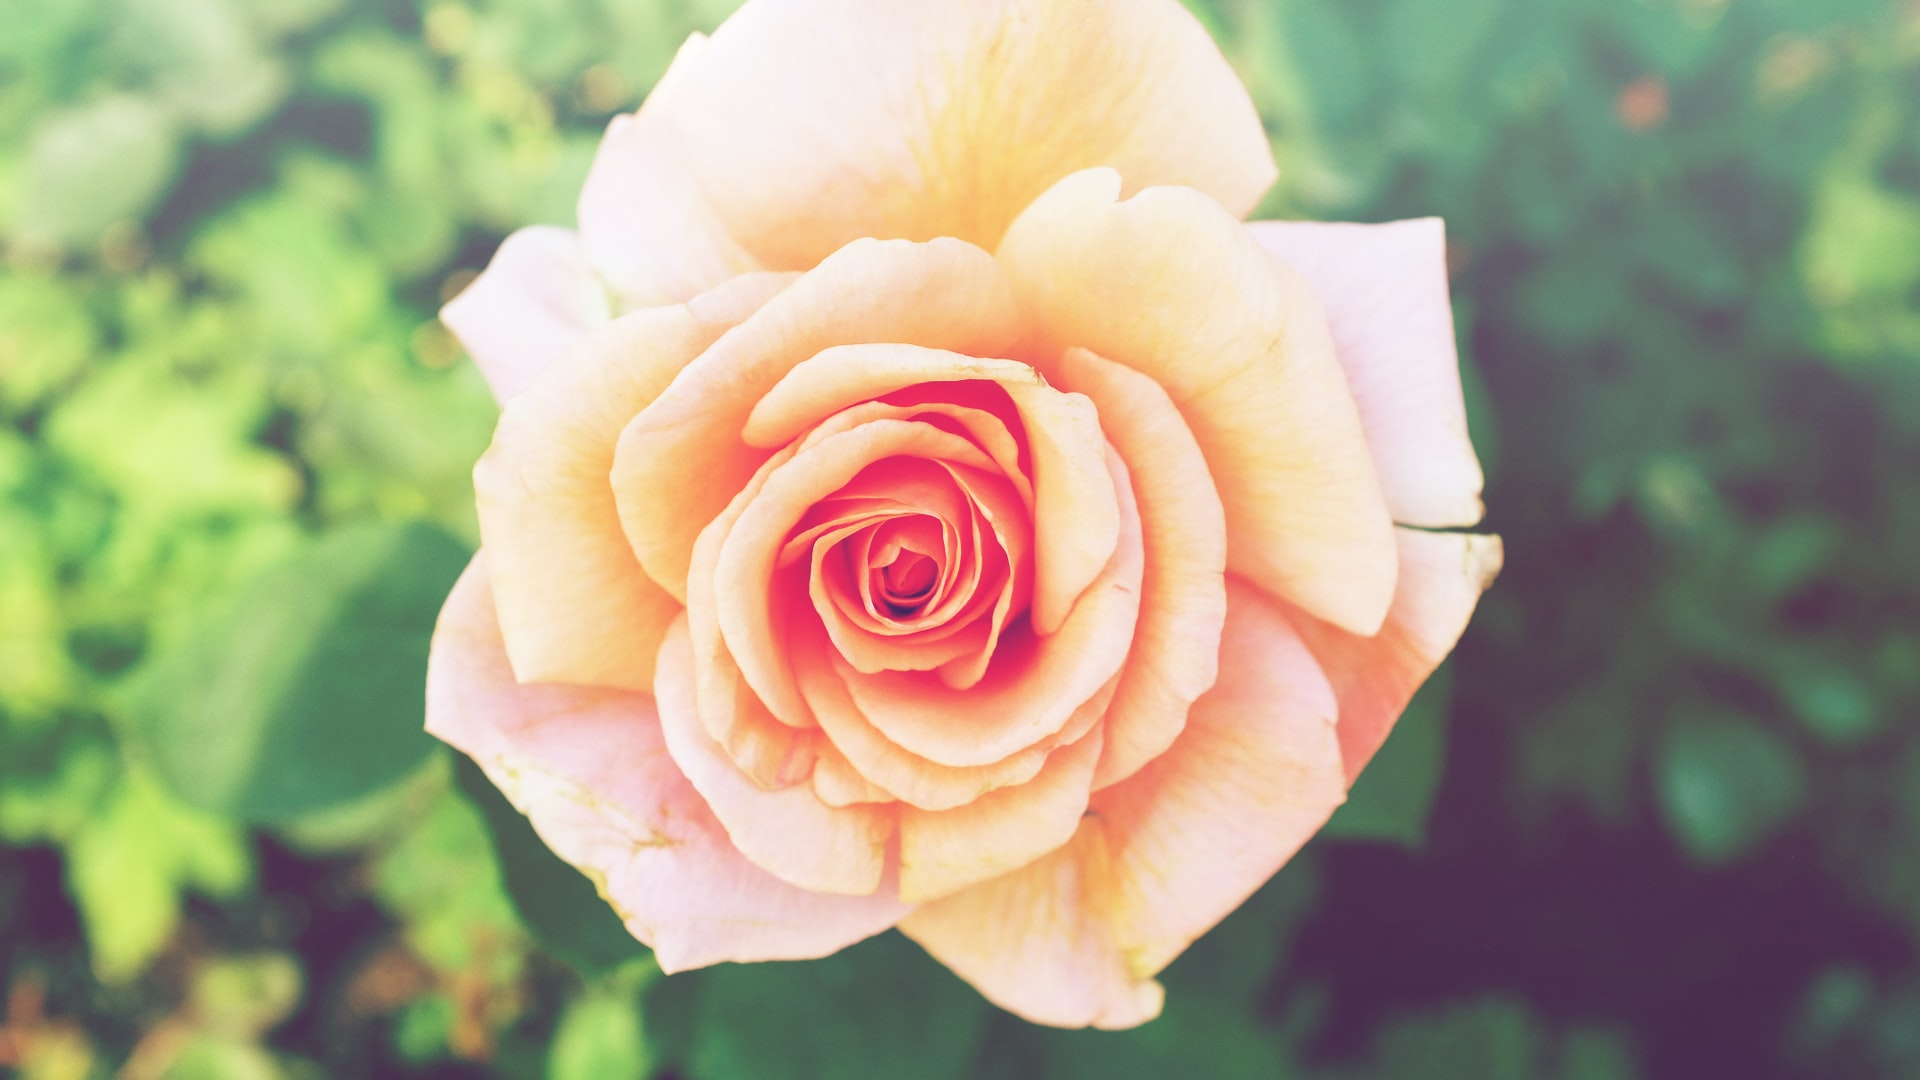 A light pink rose in full bloom